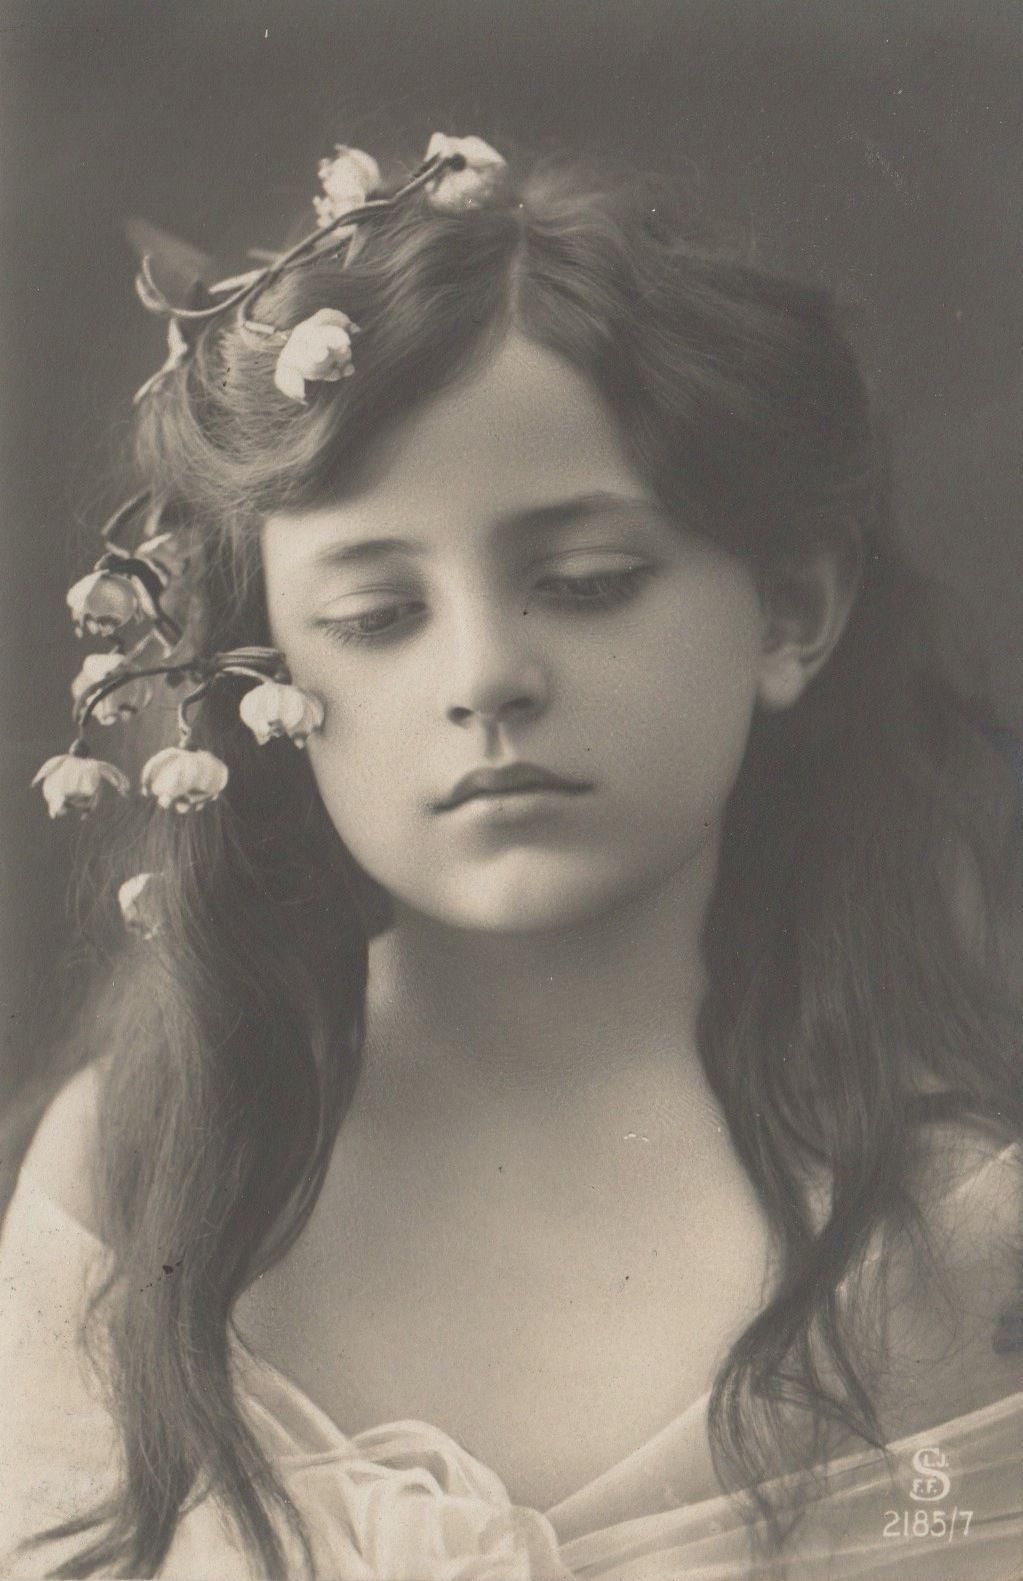 RPPC Real Photo Postcard Very Beautiful Edwardian Girl Flowers Long Hair Sad